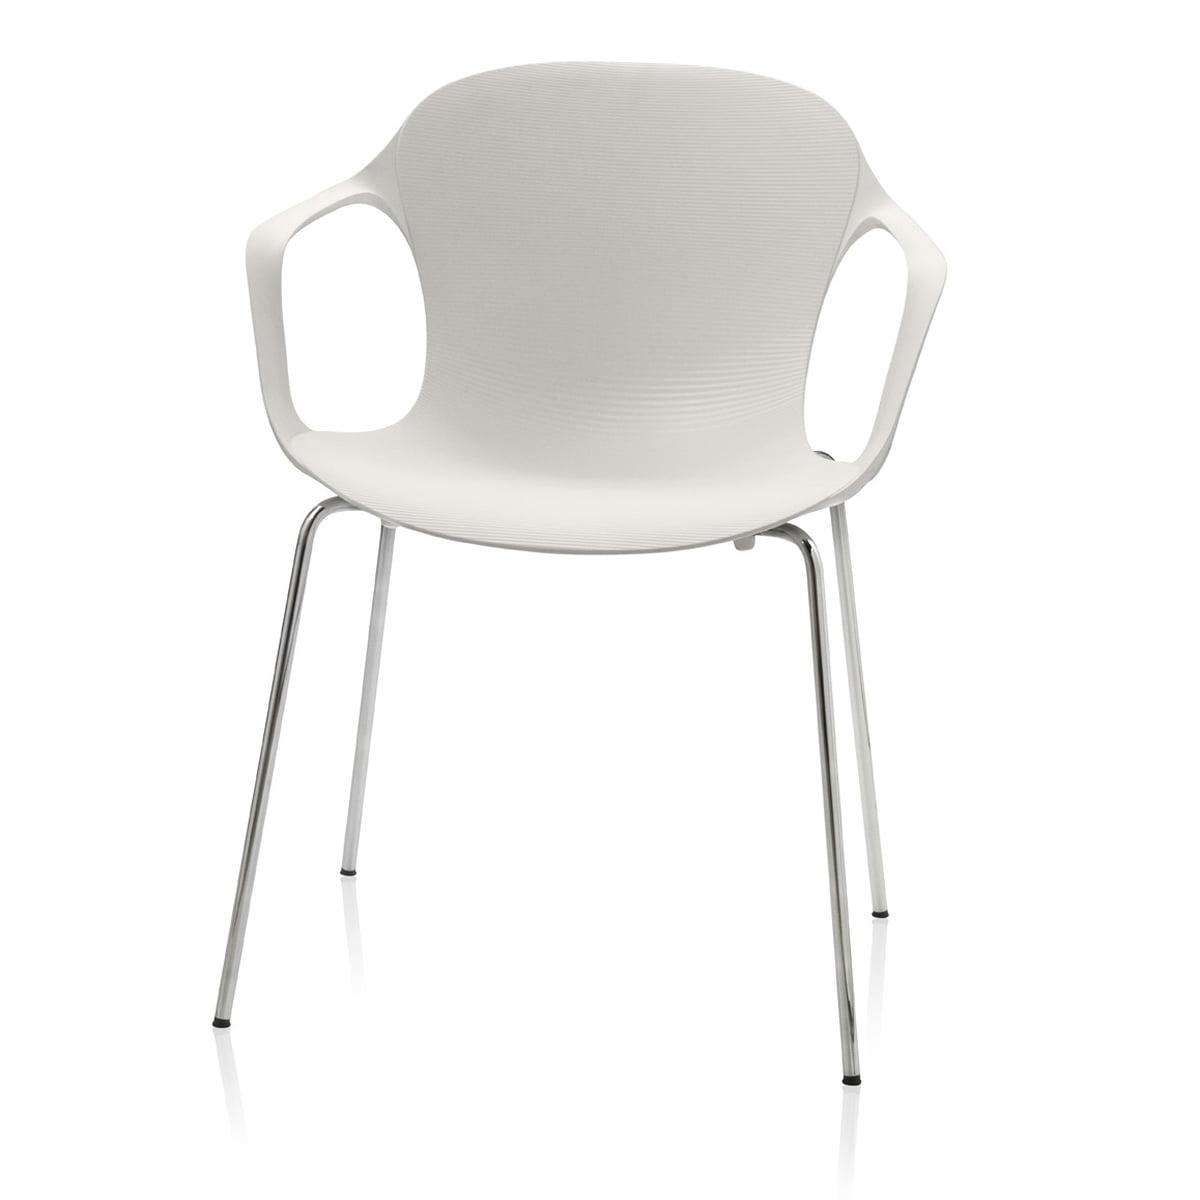 nap armchair ks60 fritz hansen shop. Black Bedroom Furniture Sets. Home Design Ideas